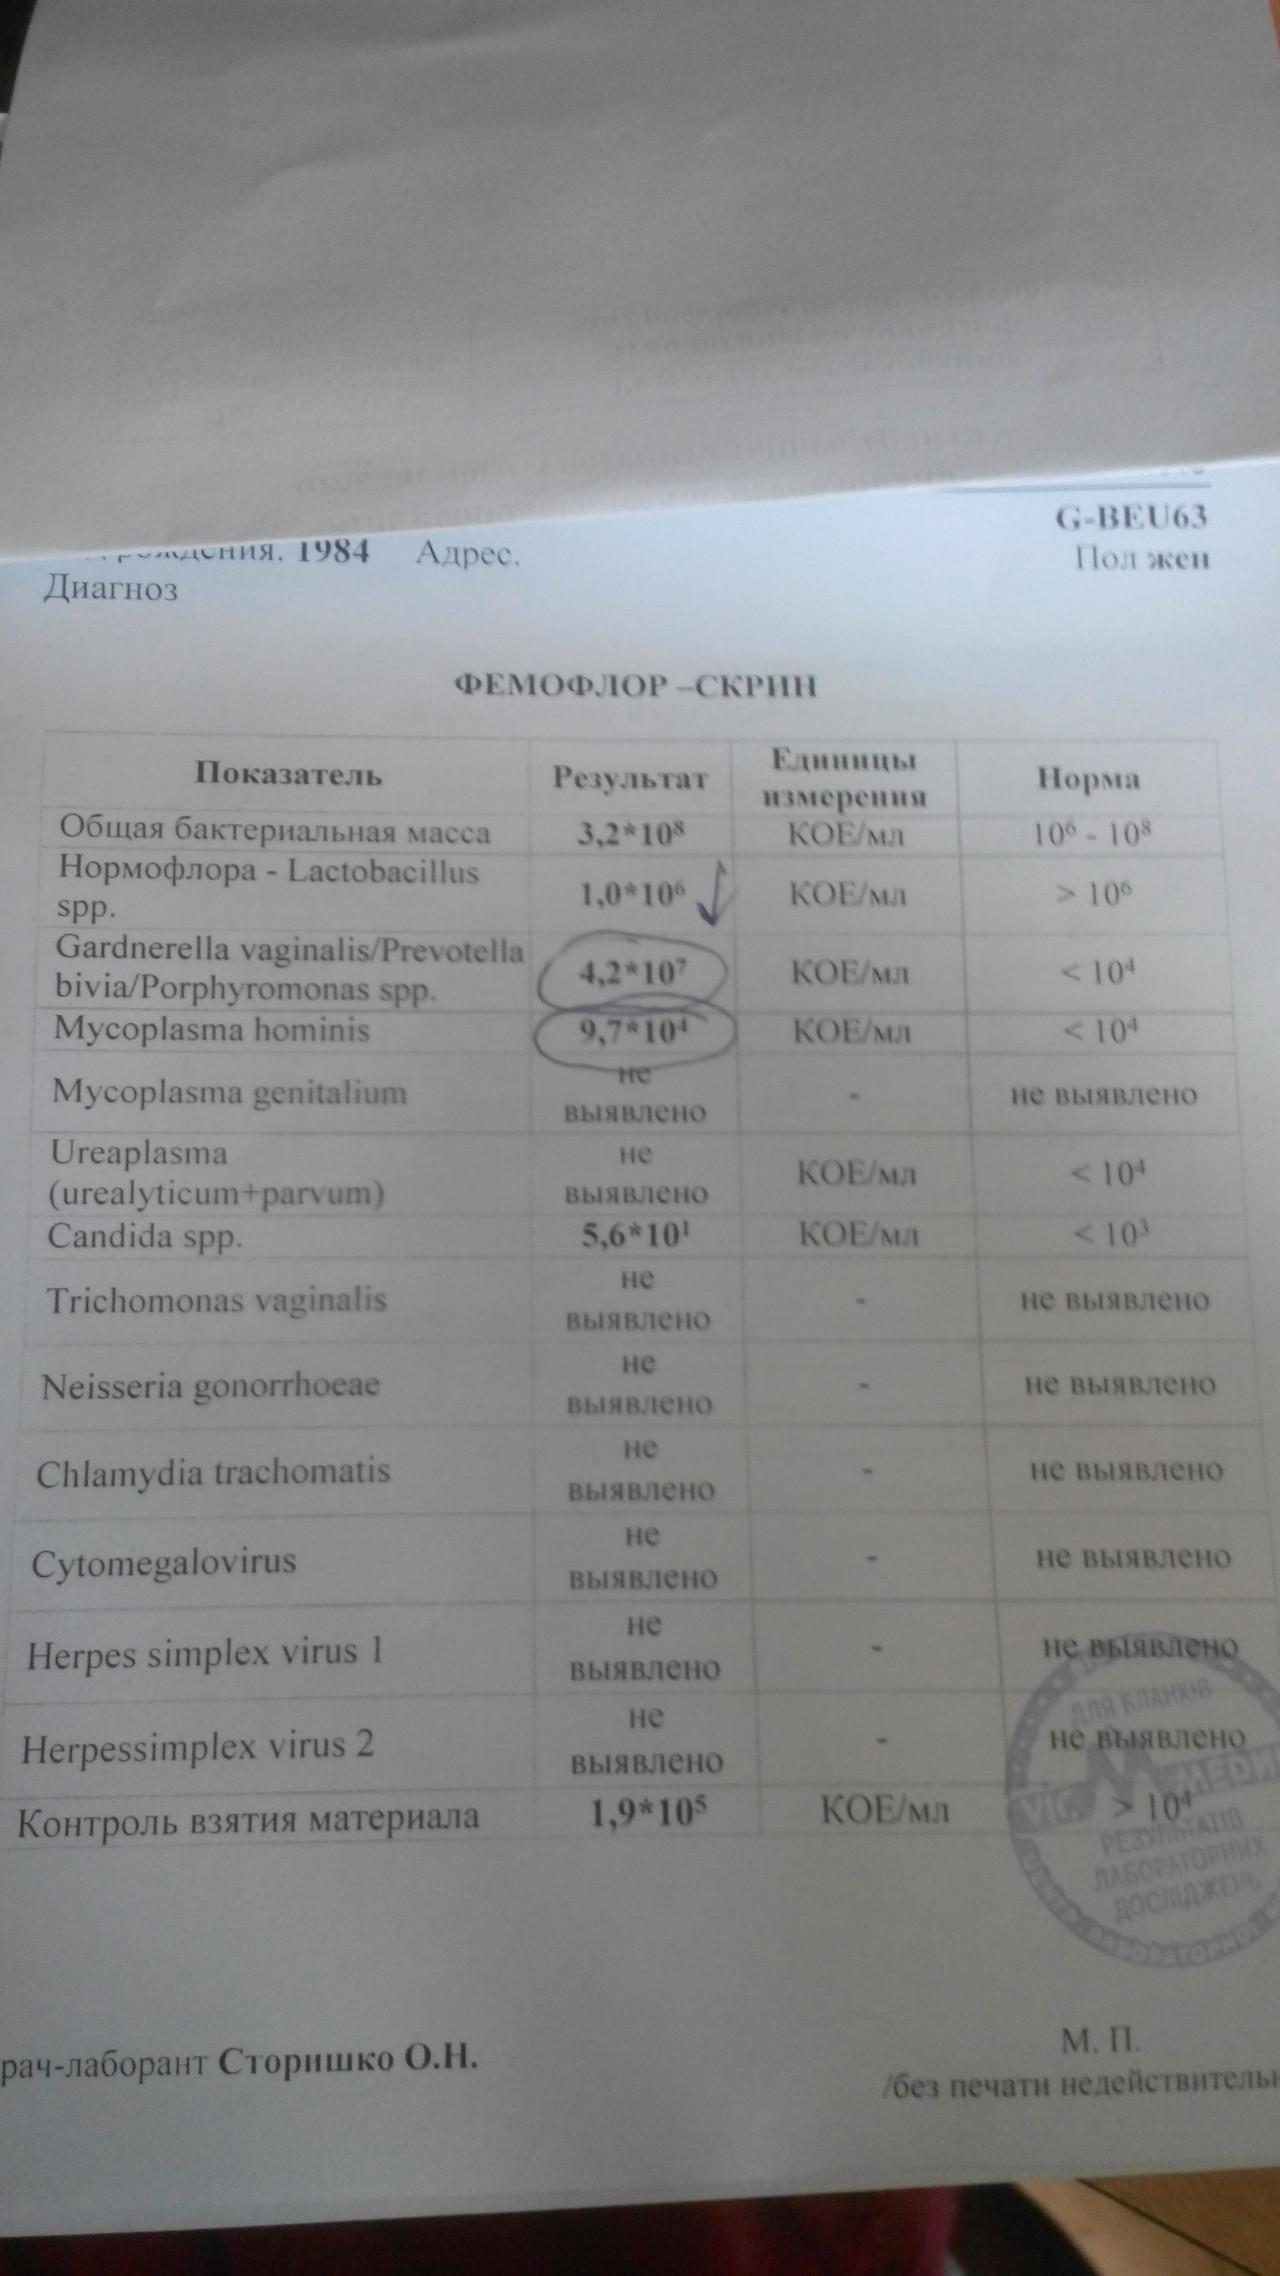 Фемофлорскрин расшифровка  Вопрос гинекологу  03 Онлайн